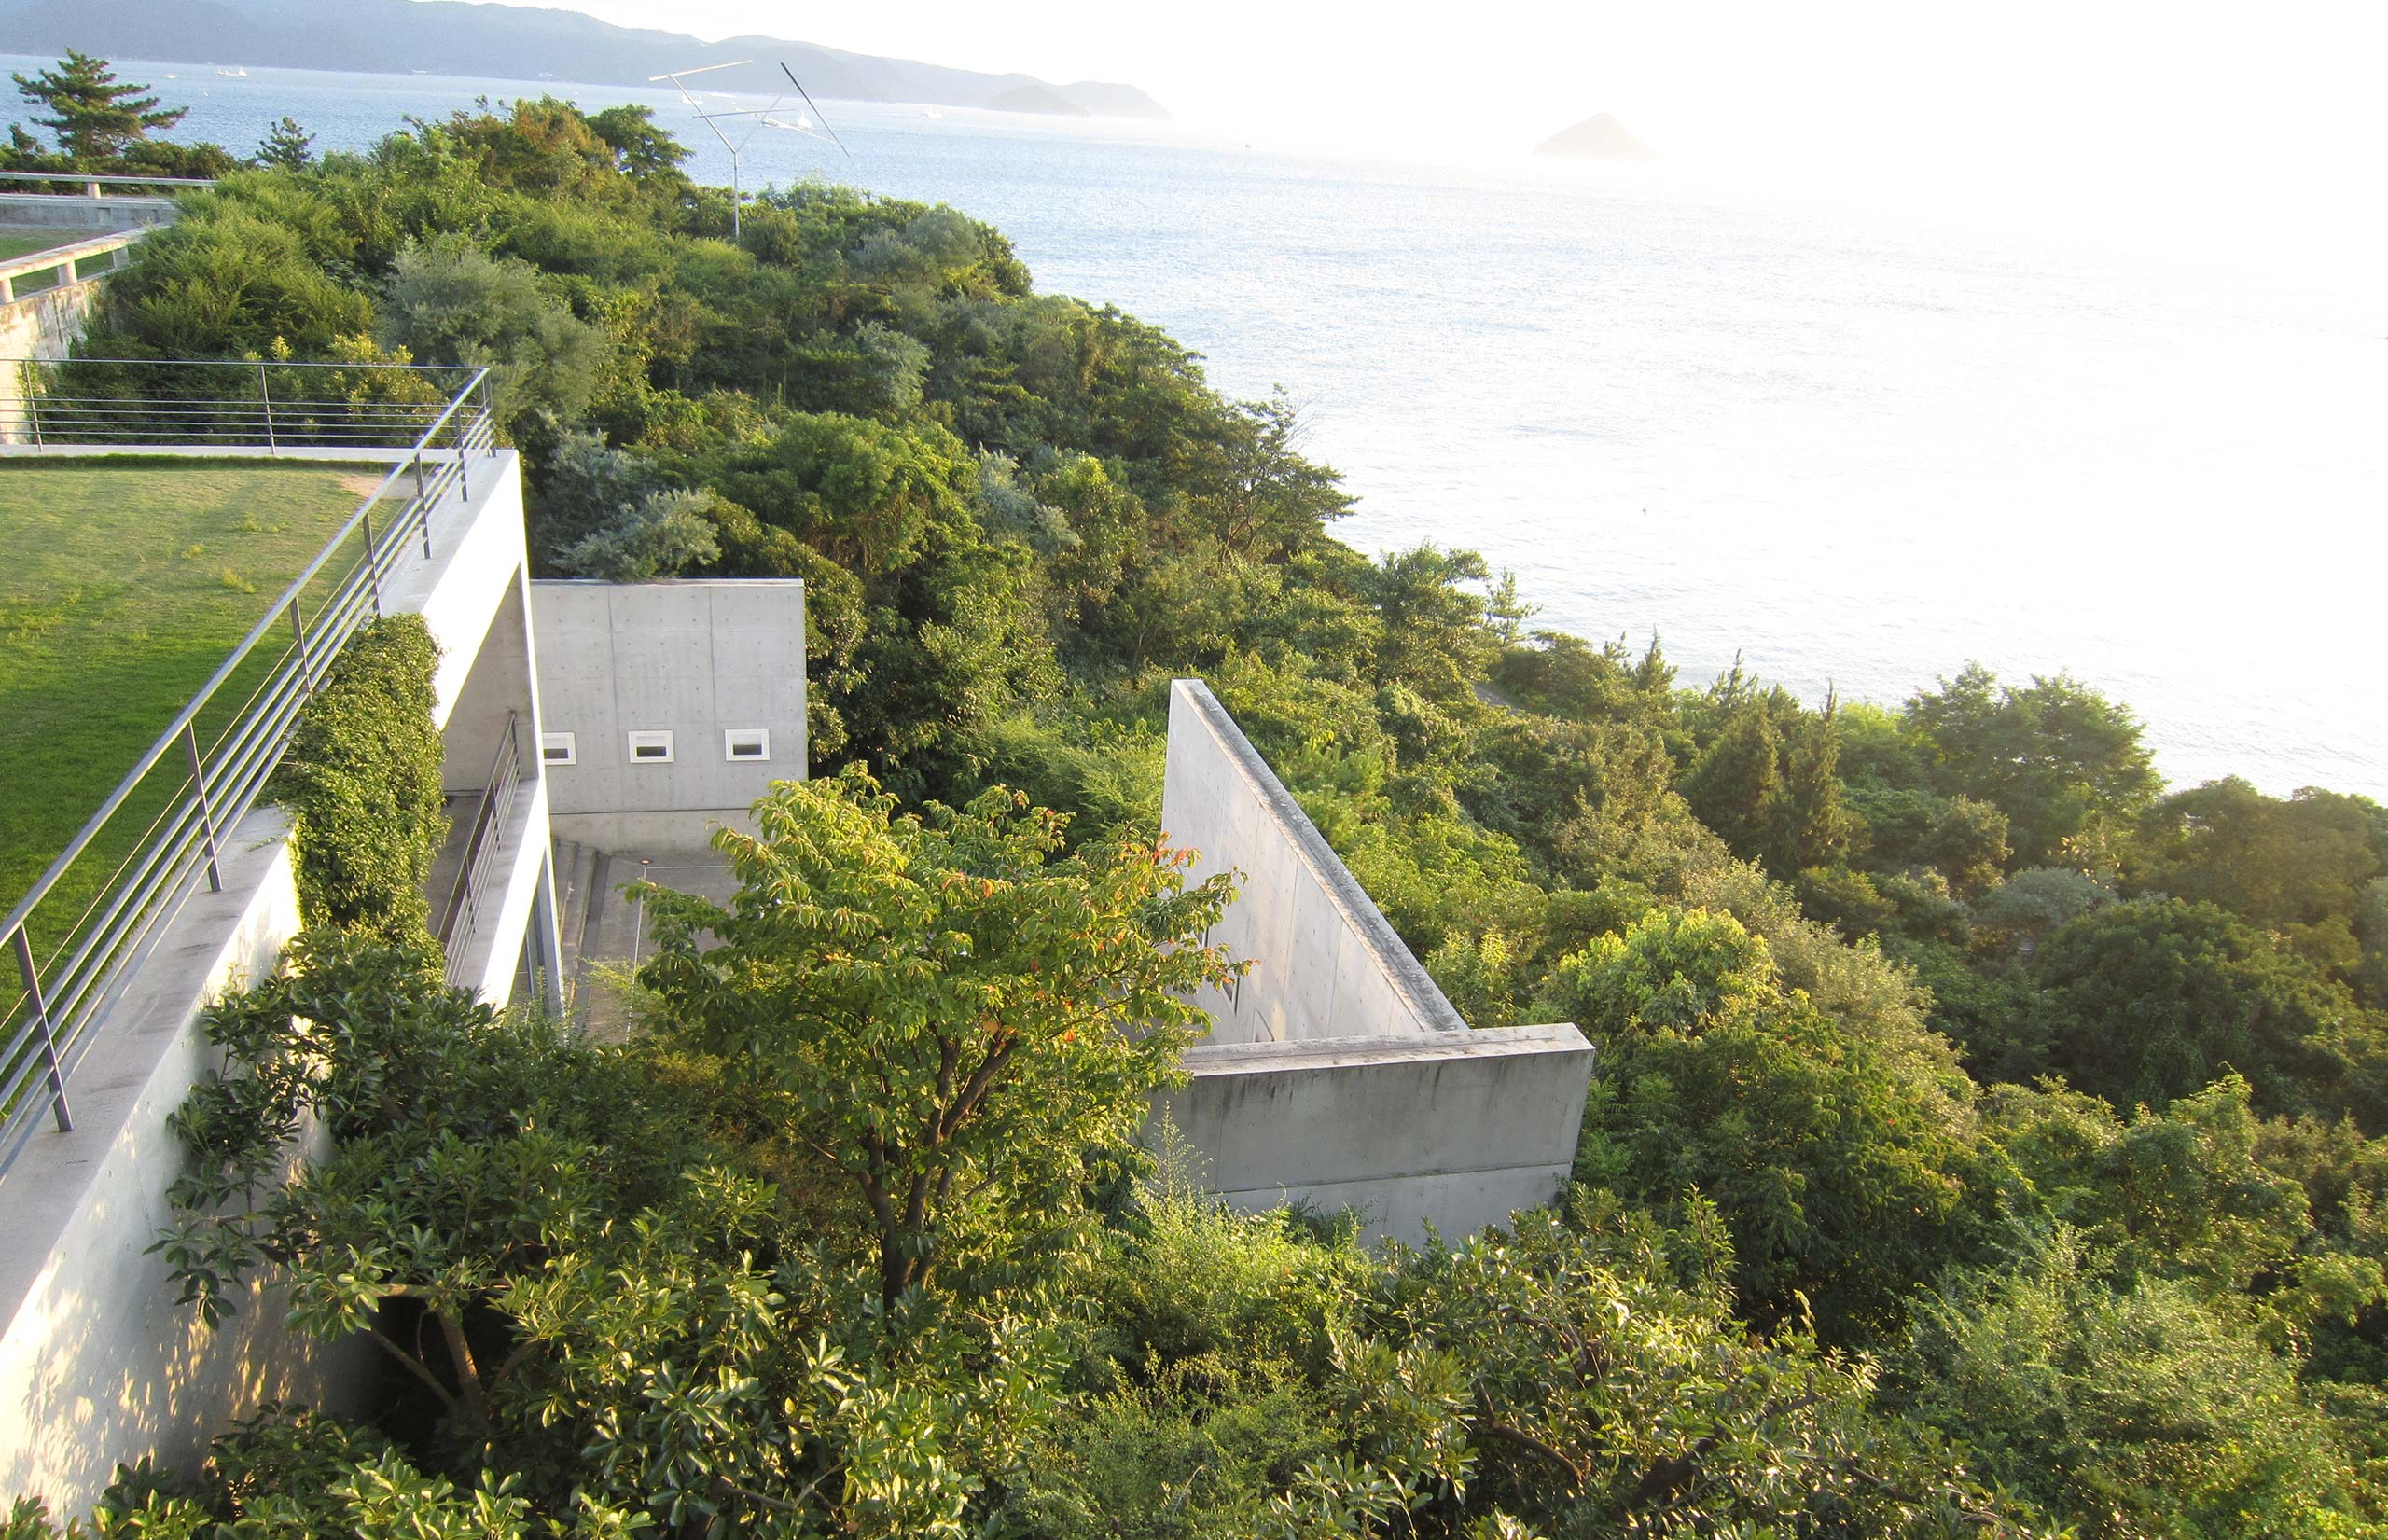 naoshima chichu architecture